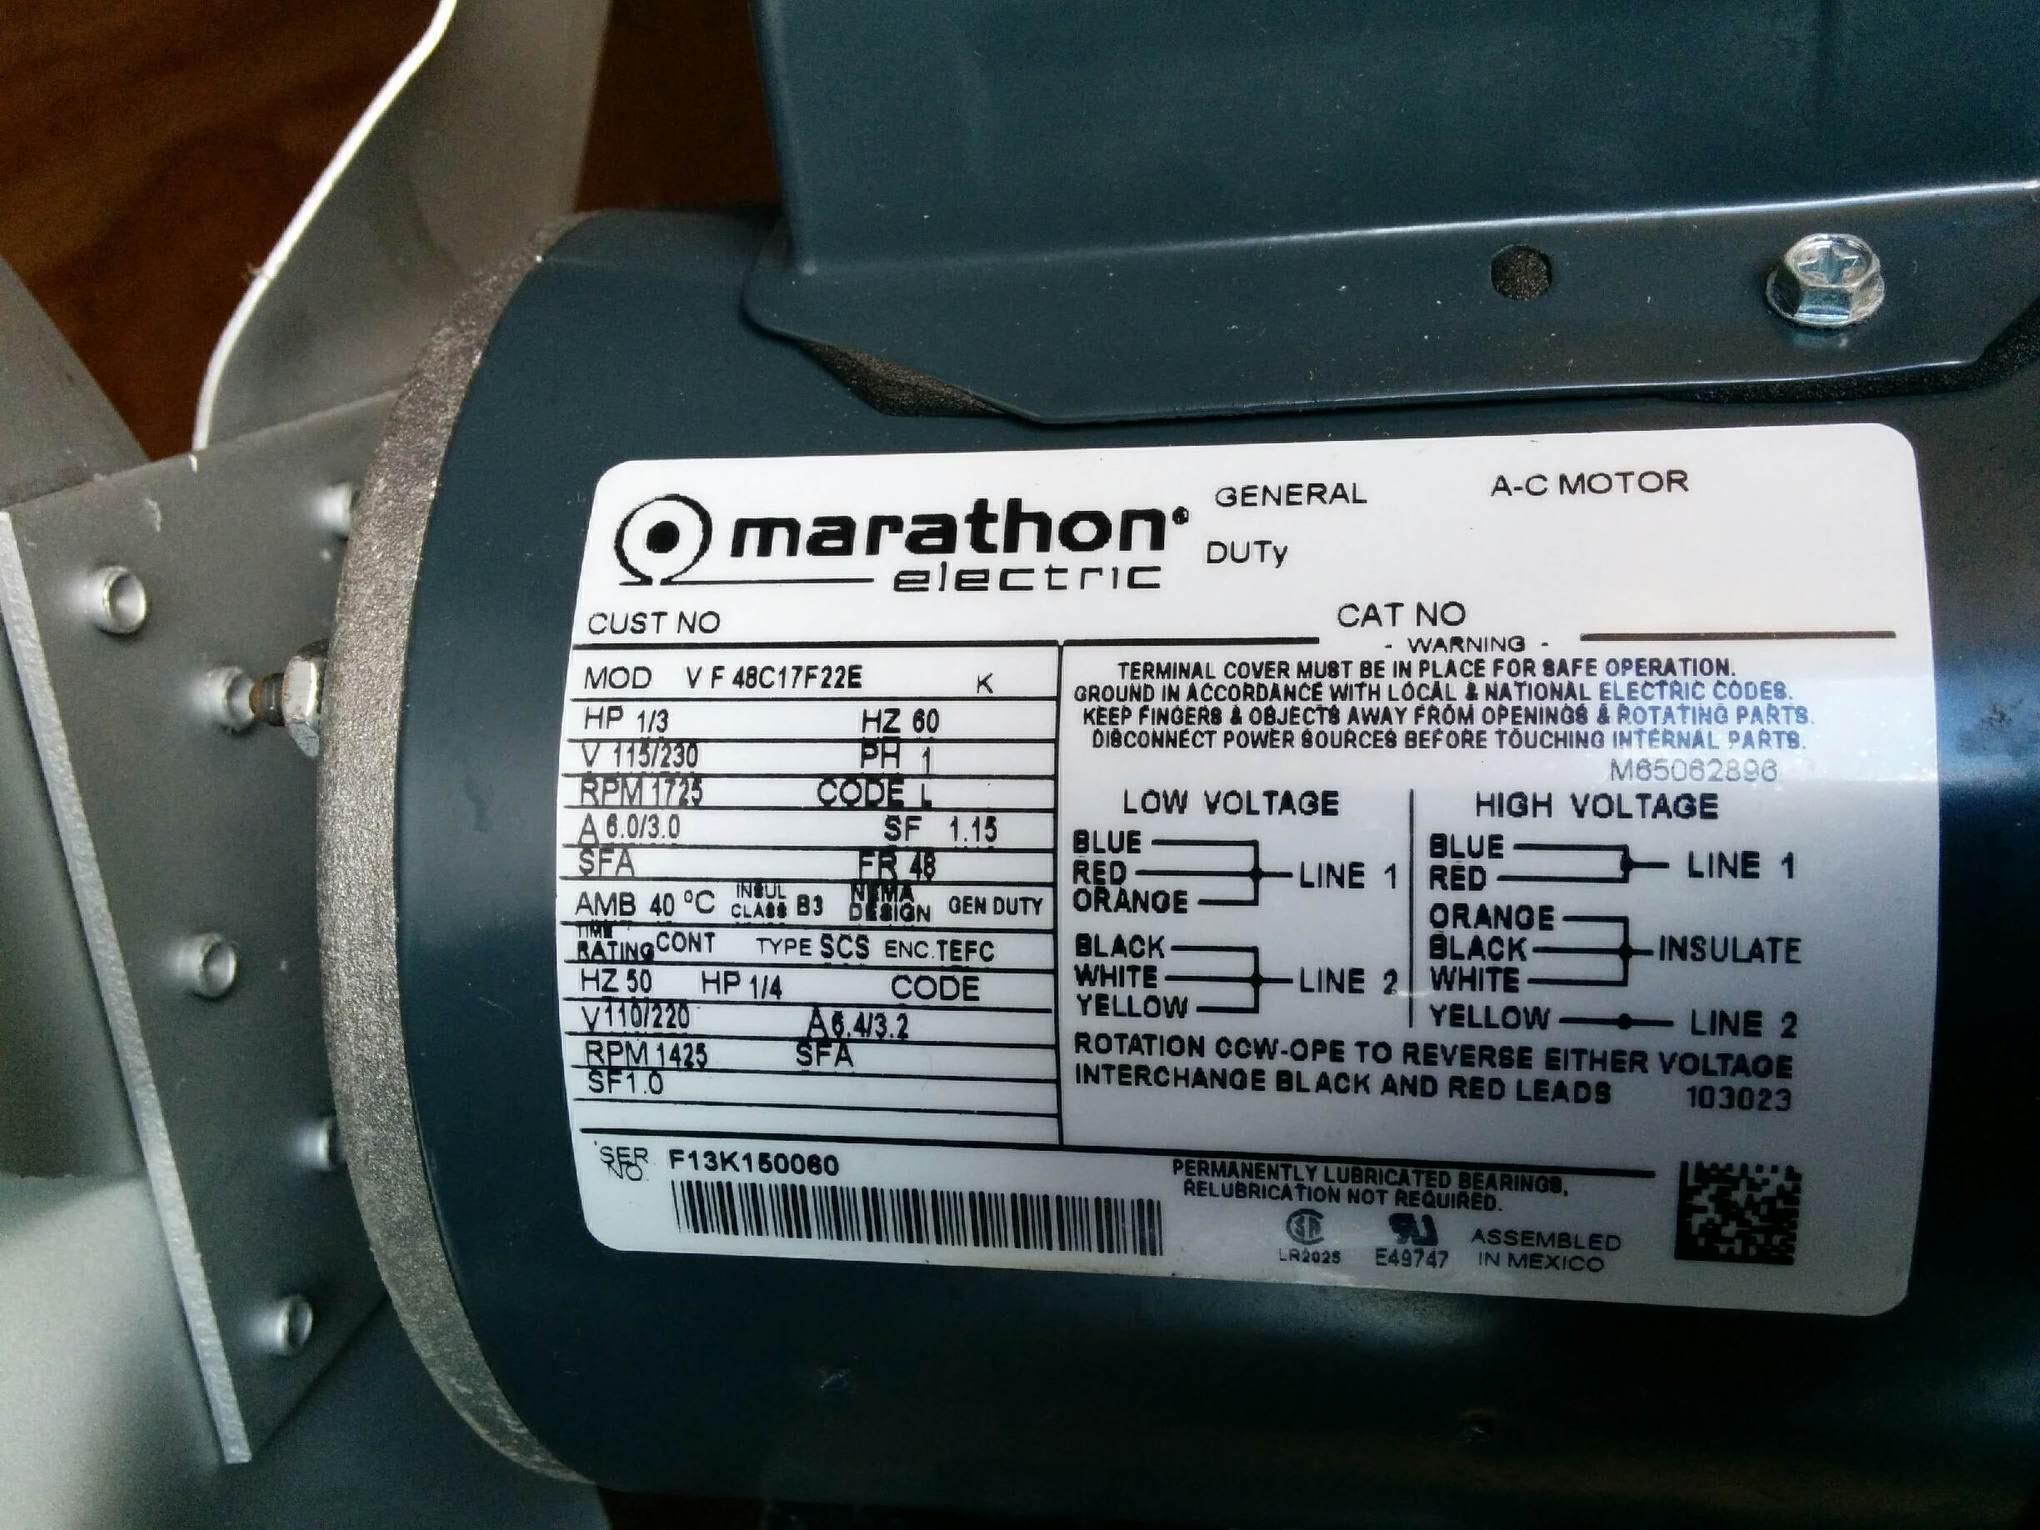 Marathon Generators Wire Diagram | Wiring Library - Marathon Electric Motor Wiring Diagram